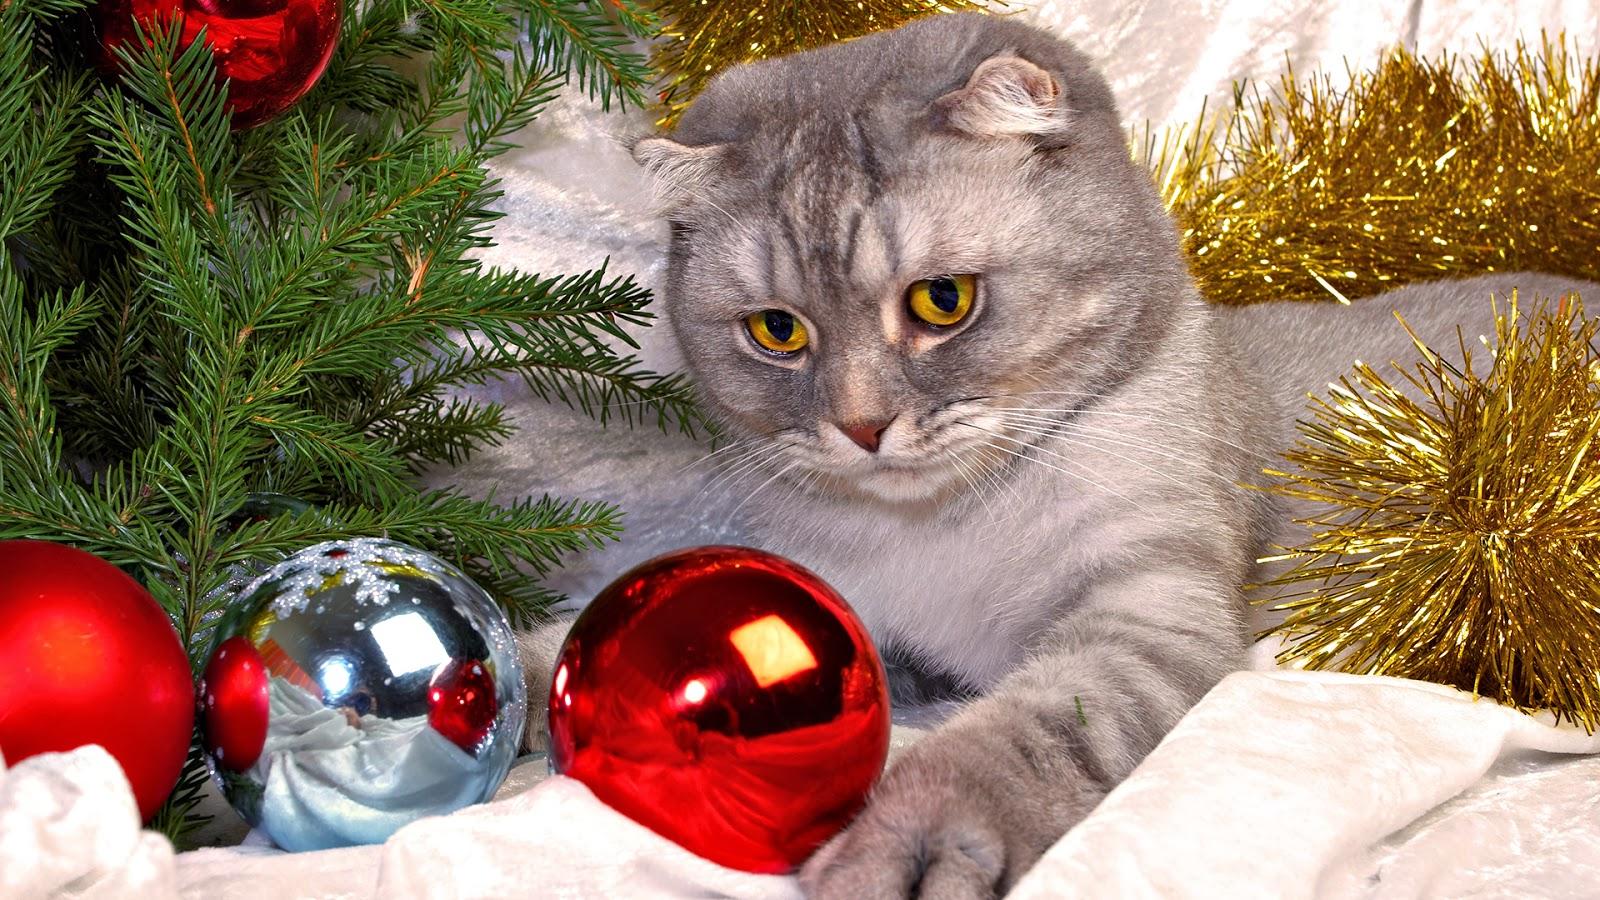 Cute Cat Wallpaper 3d Cute Cats Christmas Hd Wallpapers Hd Wallpapers Blog